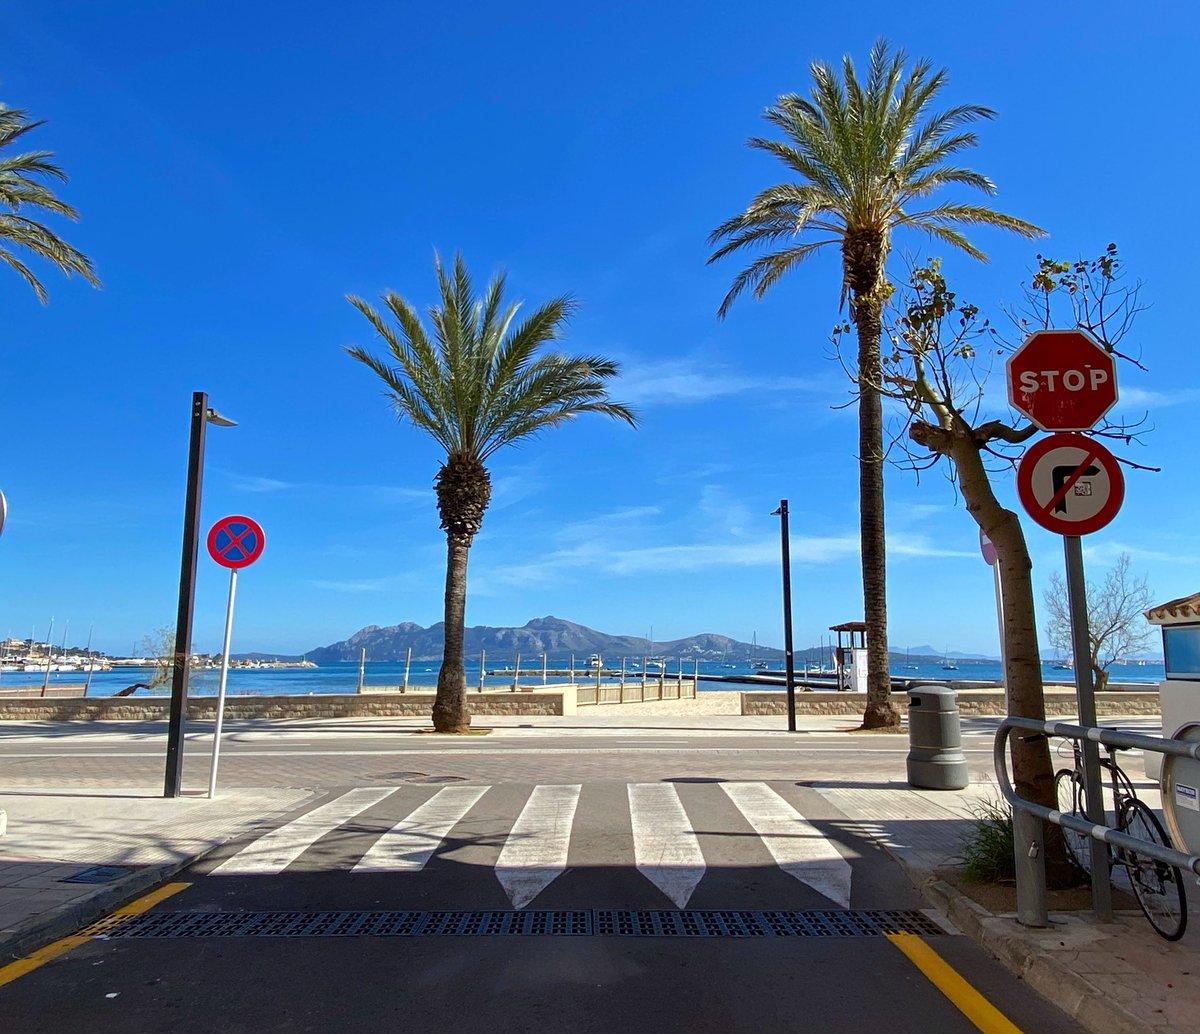 Work views #OQServiceCourse #OQRideFast #SportsMassage #work #cycling #triathlon #massage #my #shop #tienda #bici #bicycle #sol #sun #beautiful #bonito #day #dias #bikelife #PuertoPollensa #mallorcacycling #igers #Mallorcapic.twitter.com/J3G5fk0LFg